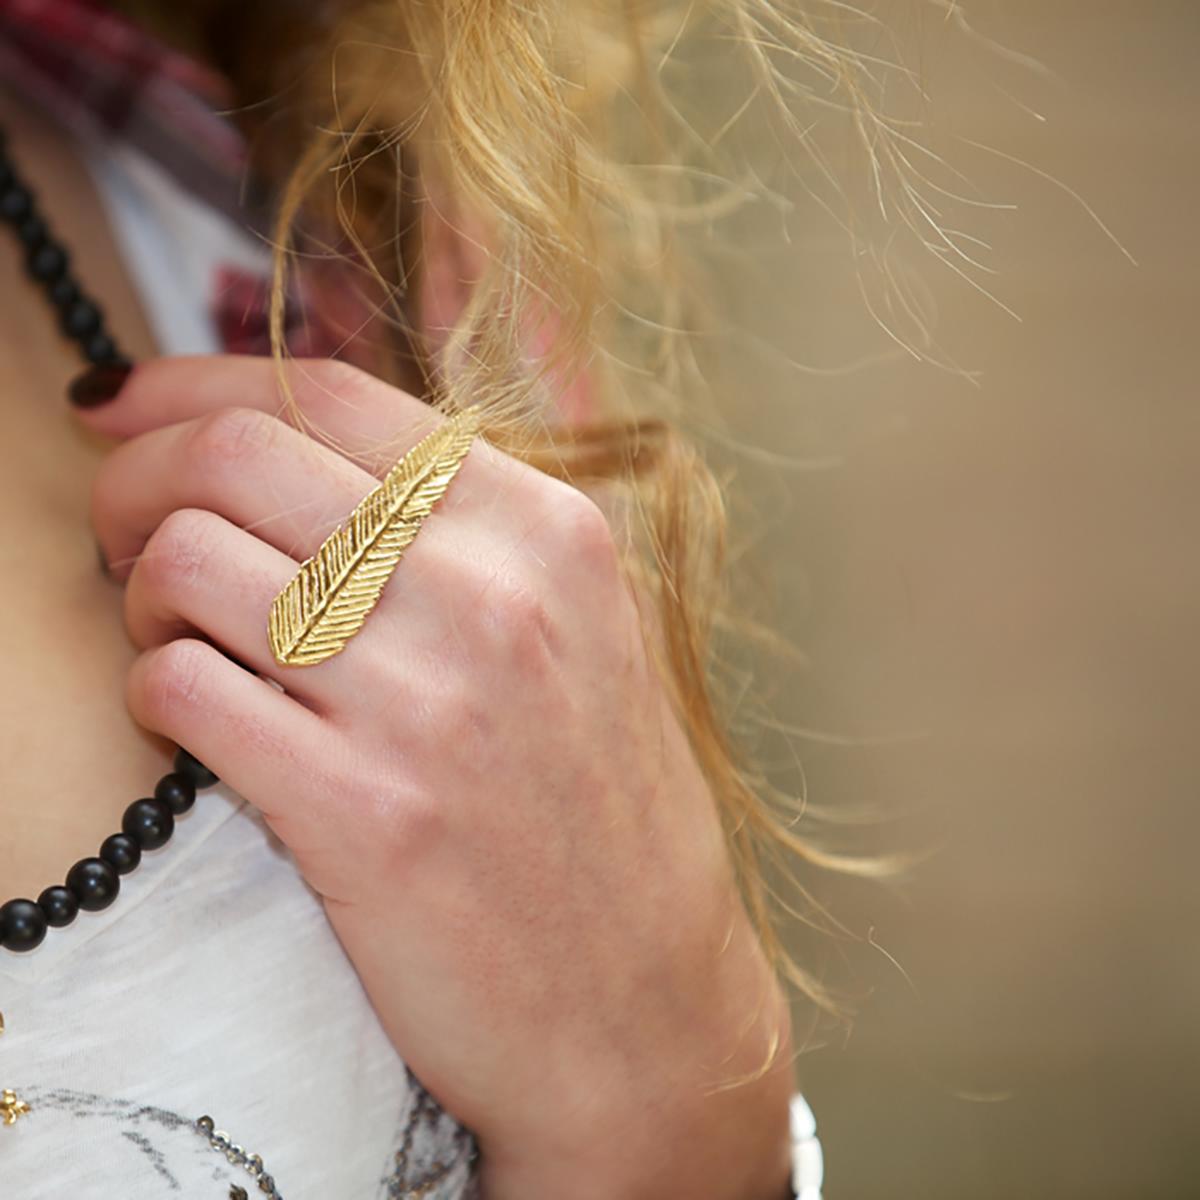 انگشتر طلا پر سه انگشتی 2